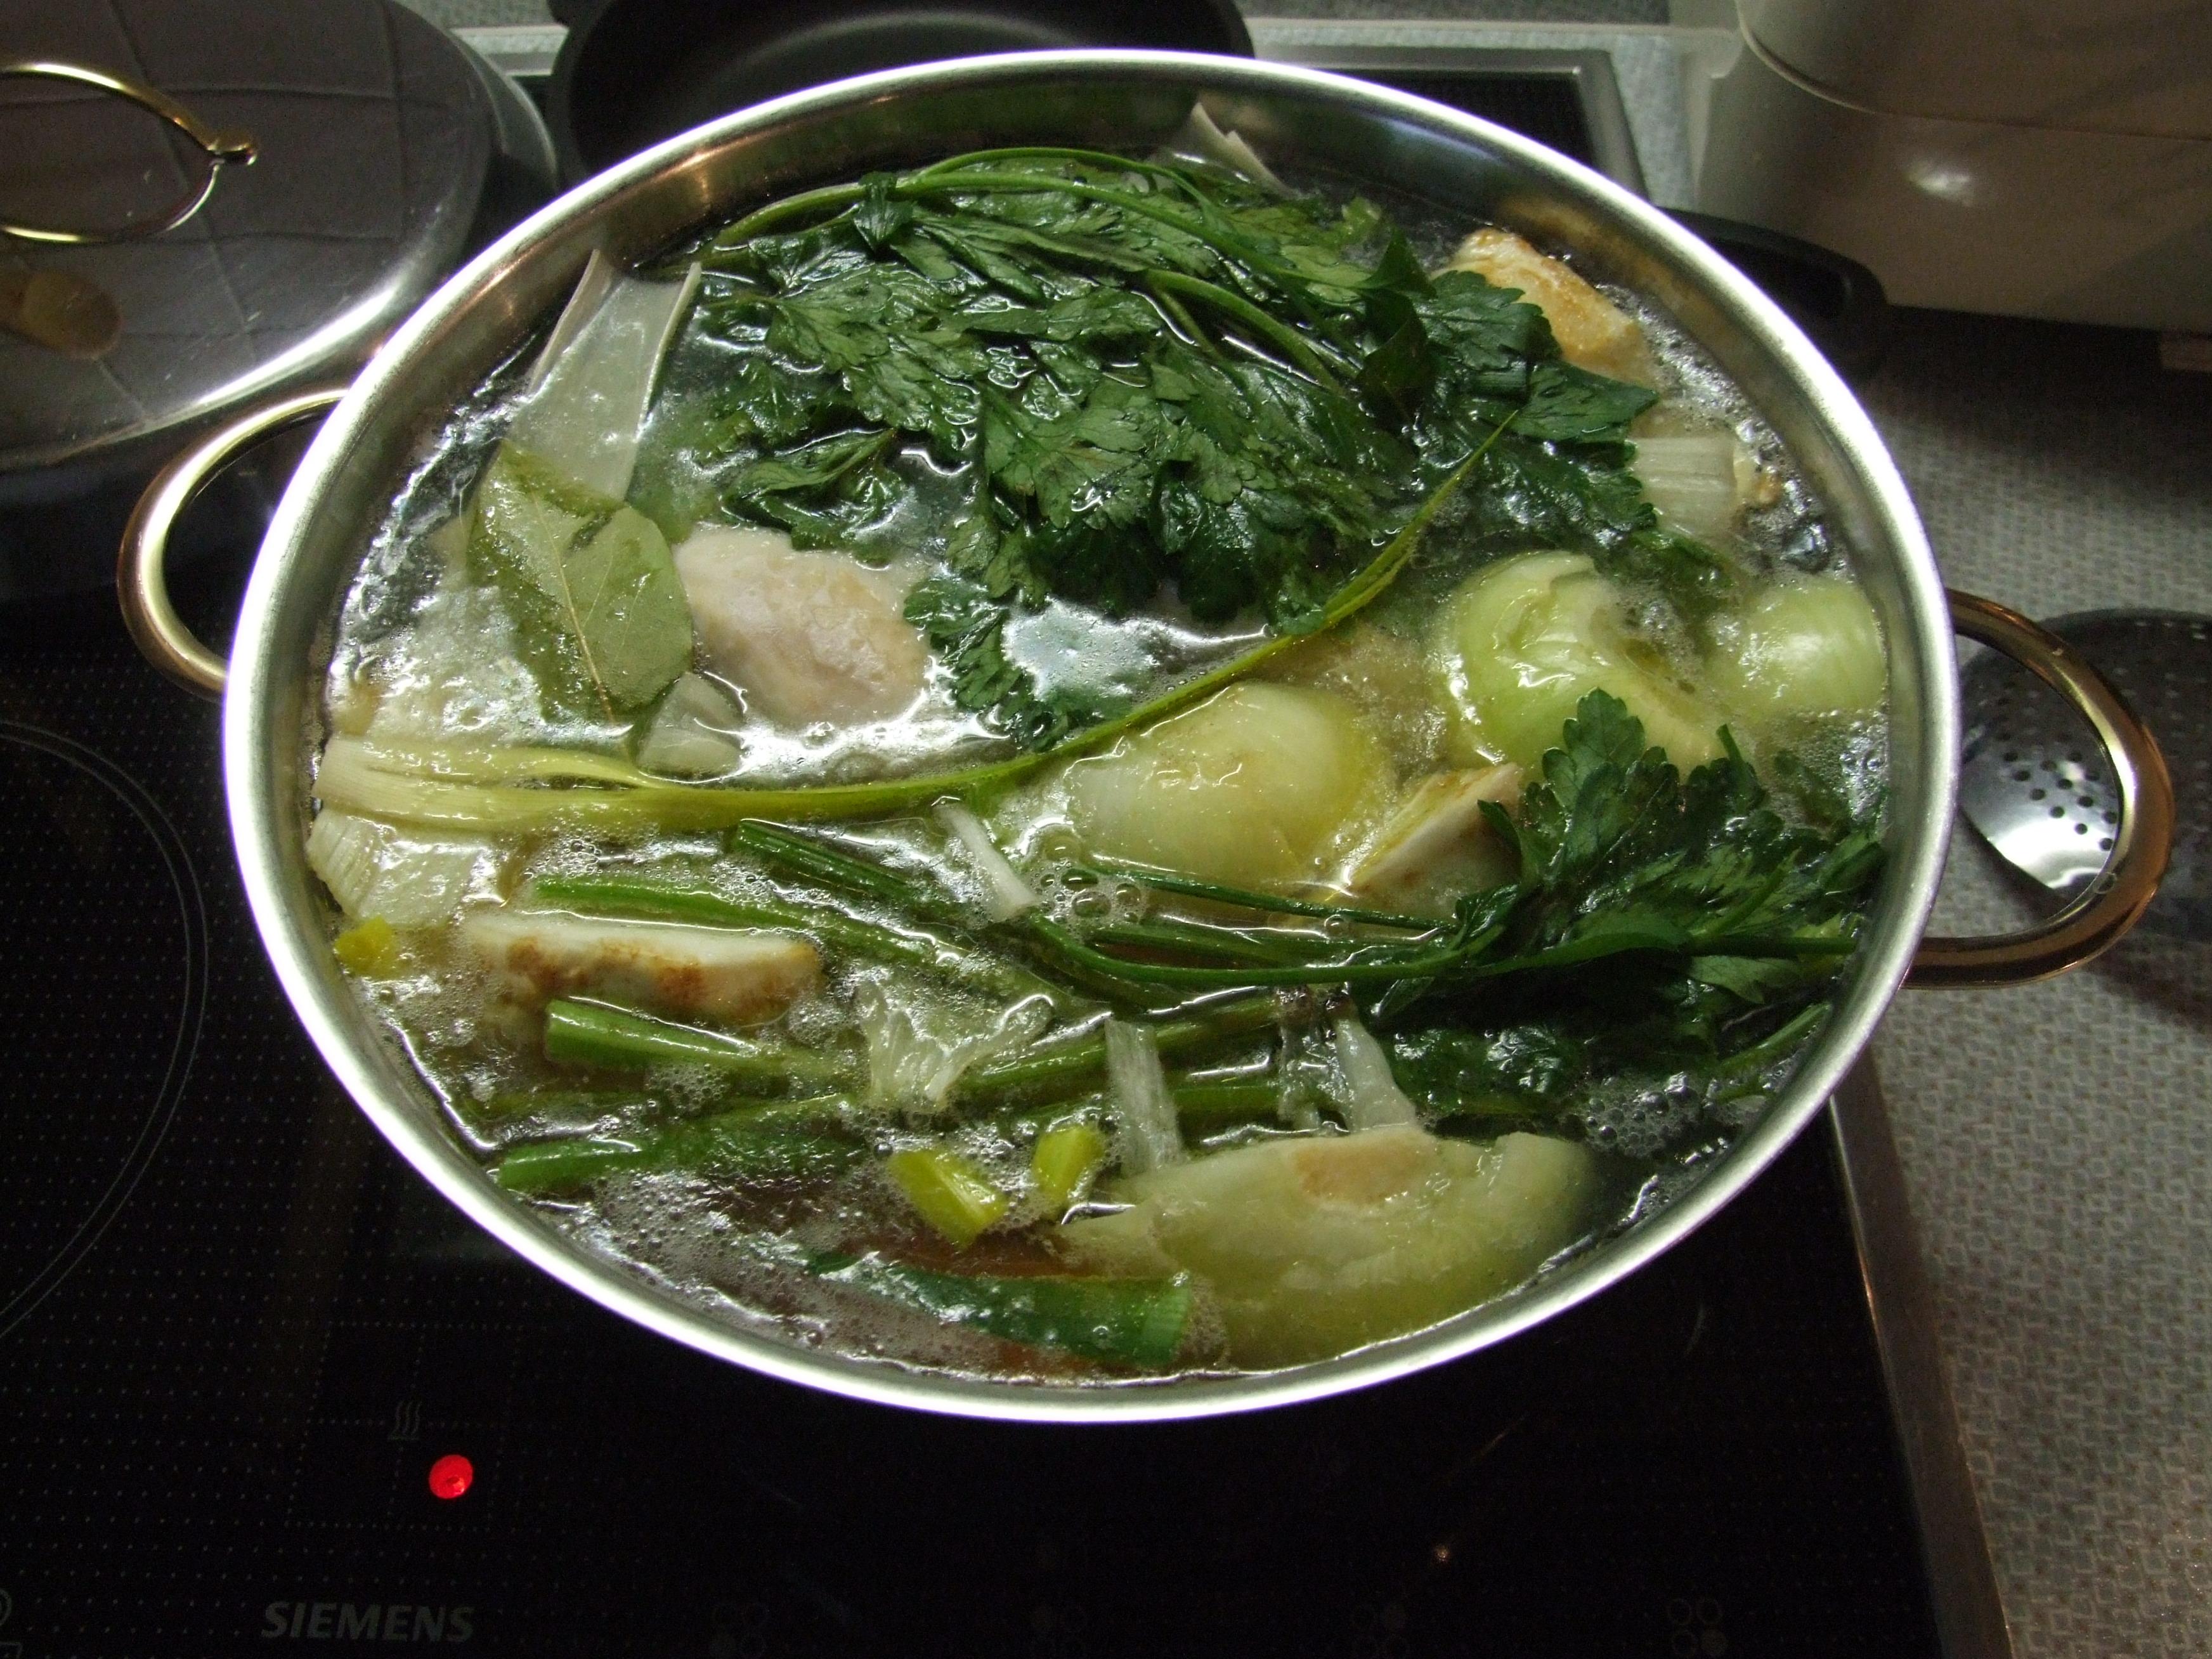 File:Chicken soup 3,.JPG - Wikimedia Commons